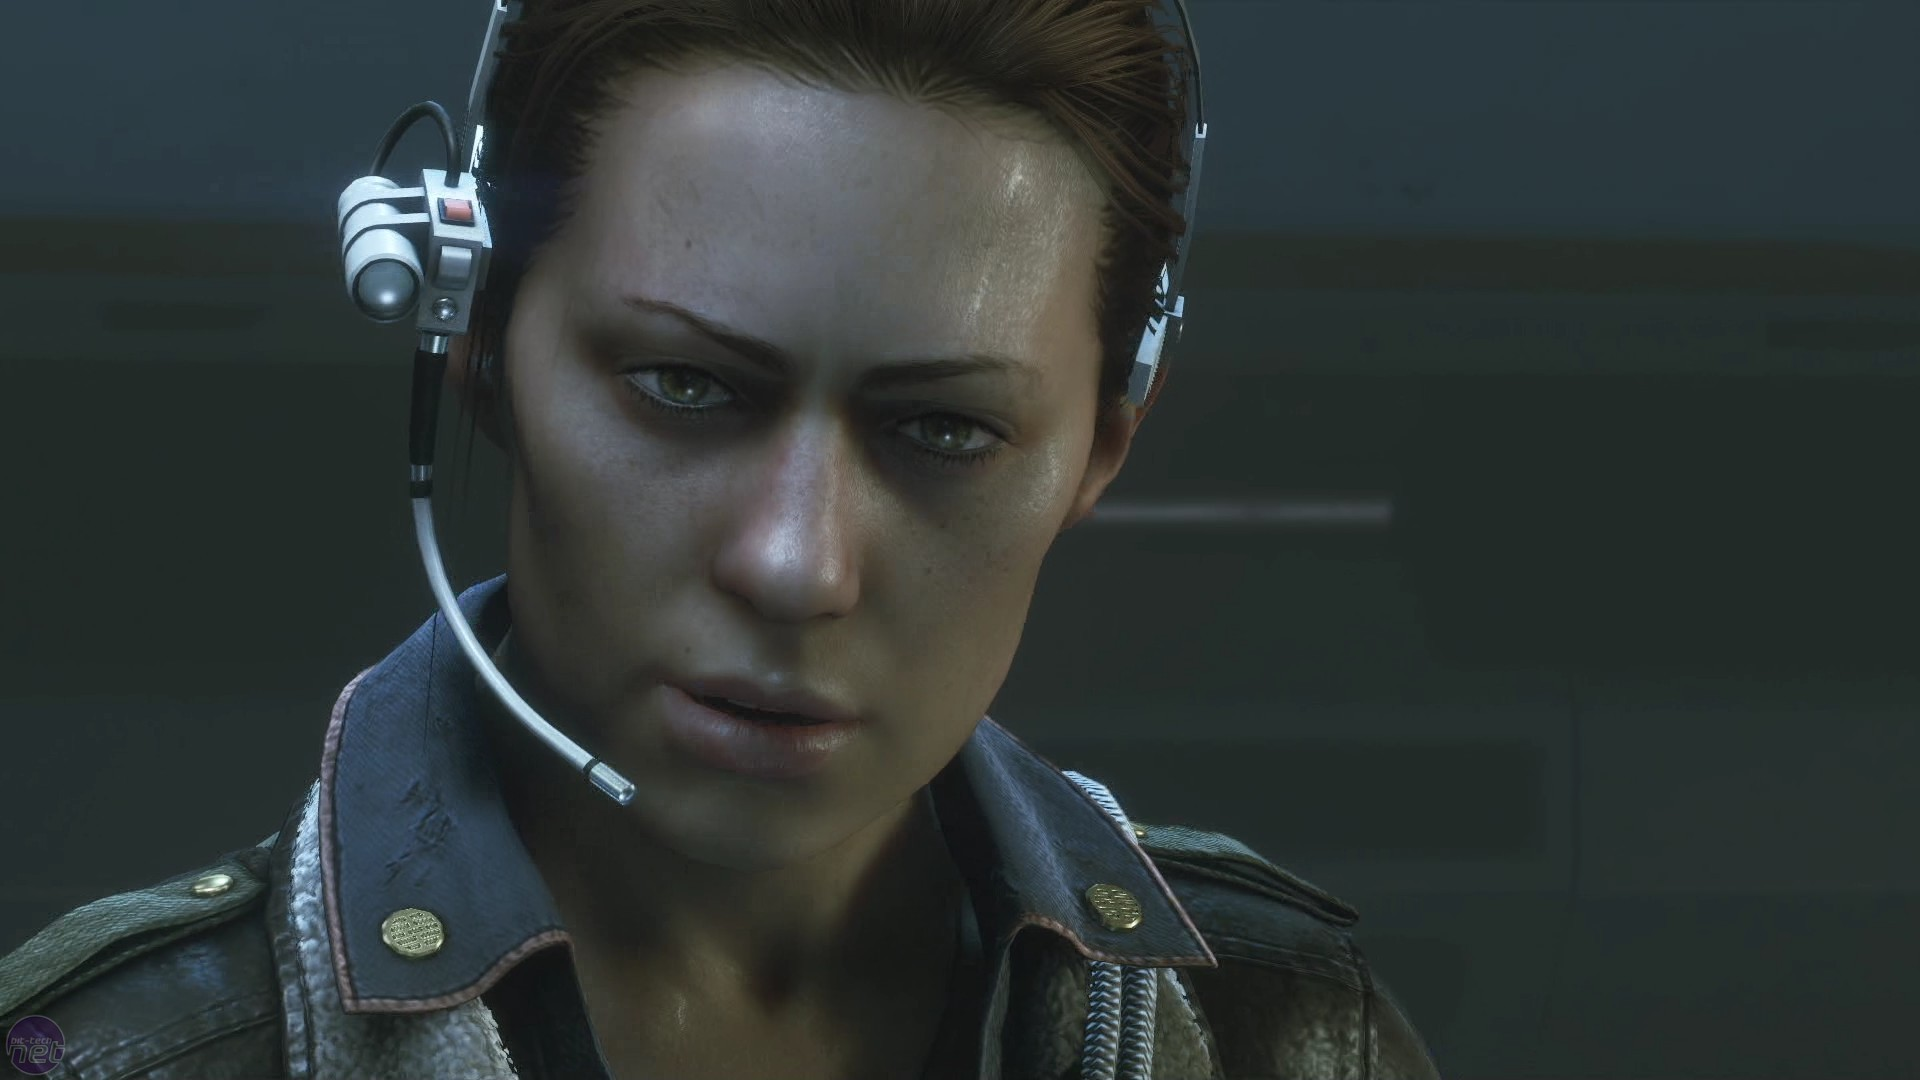 Amanda, la fille de Ripley, est à la recherche de sa mère..